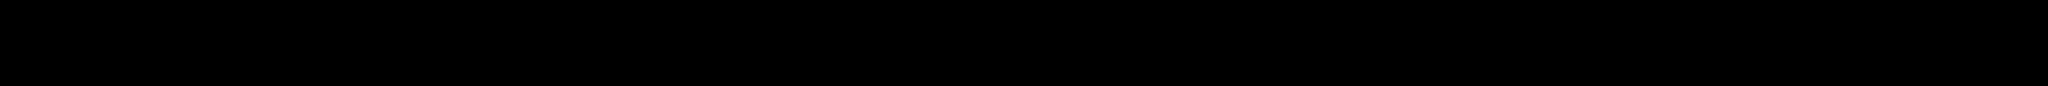 RIDEX 1K0 698 151 A, 1K0 698 151 F, 1K0698151K, 8Z0 698 151 A, JZW 698 151 Bremsekloss sett